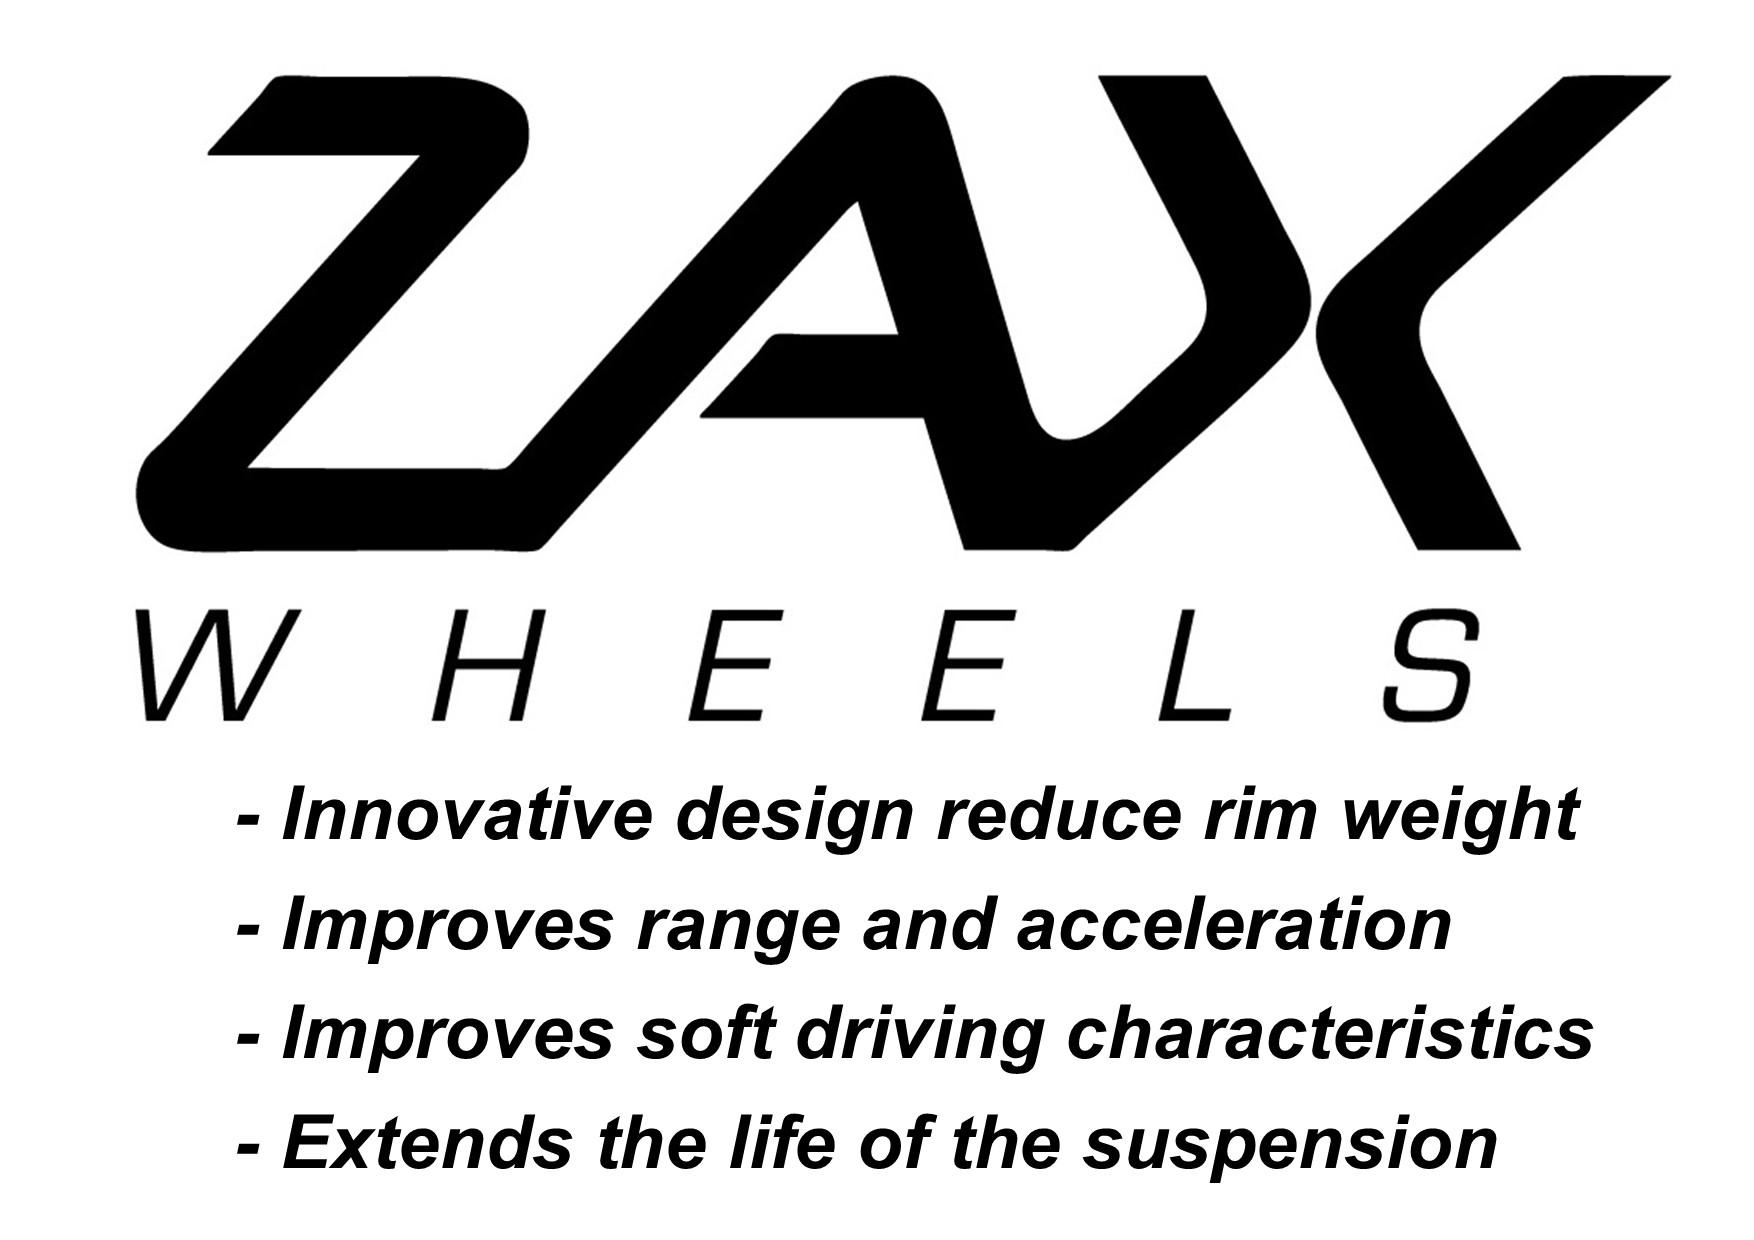 zax-wheels-18-19-20